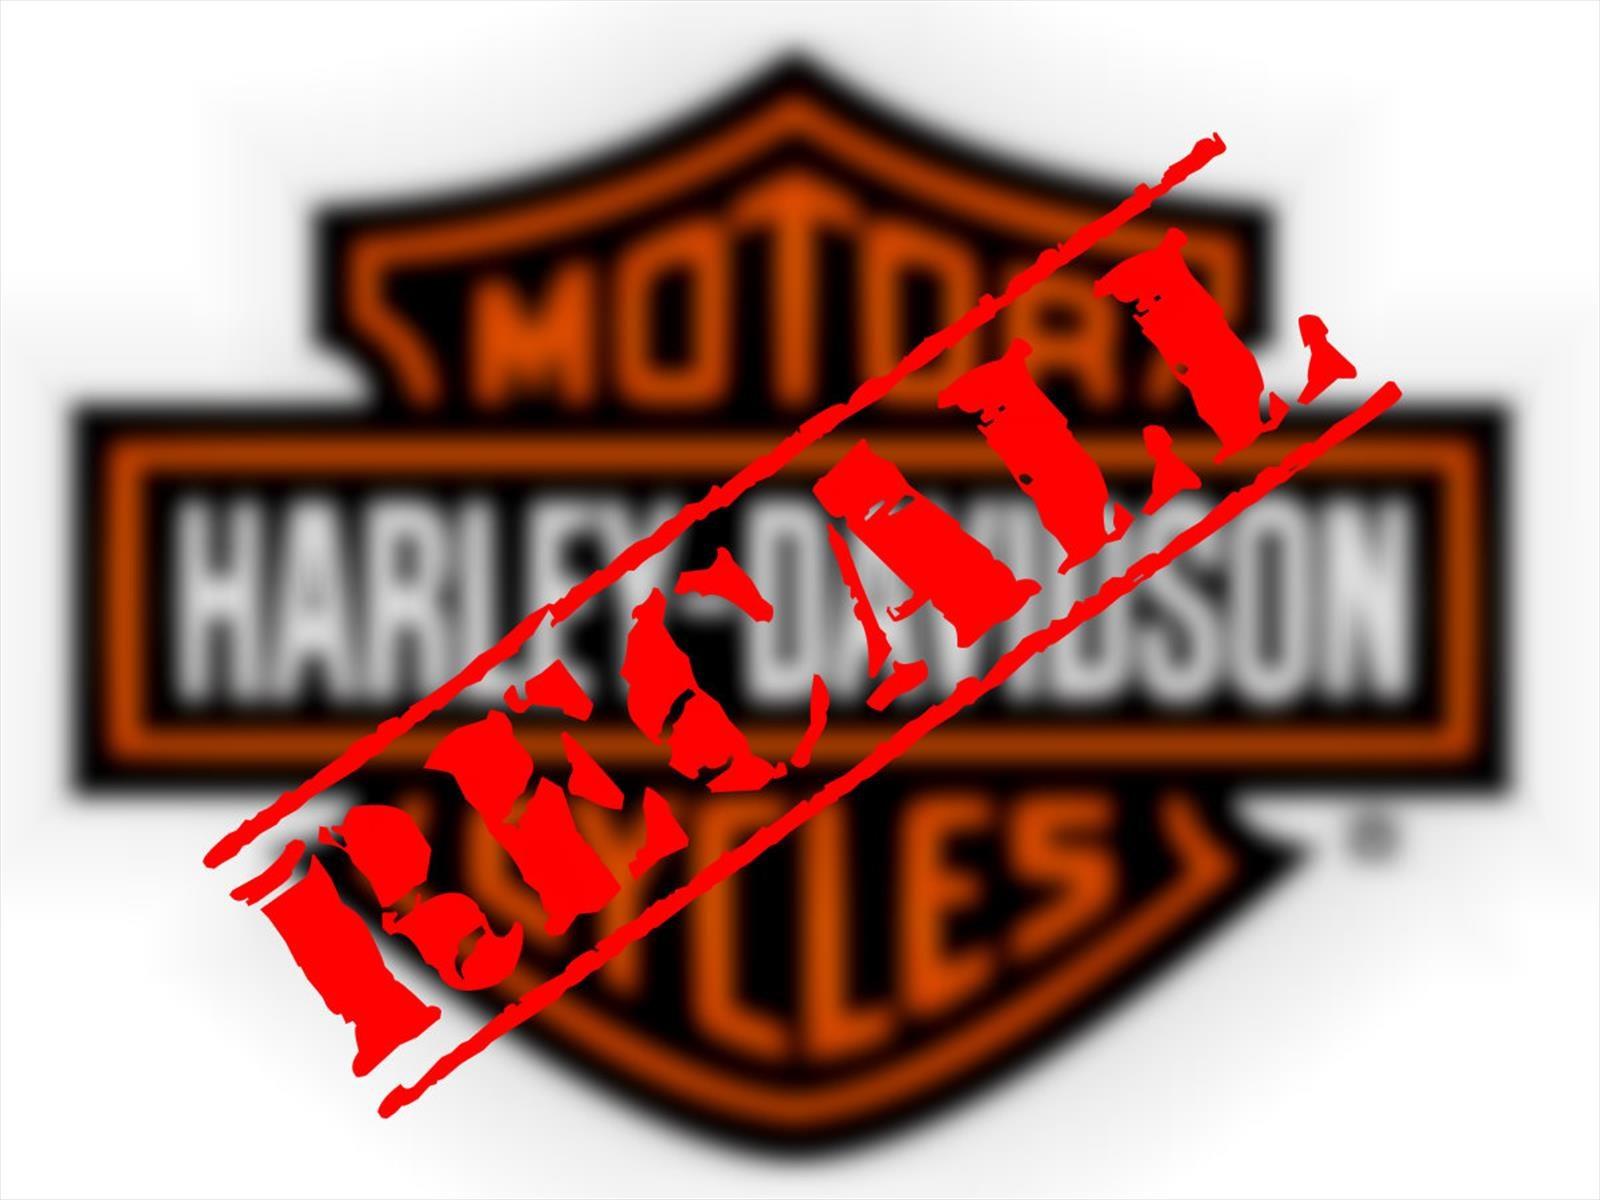 Harley-Davidson llama a revisión a 57,000 unidades